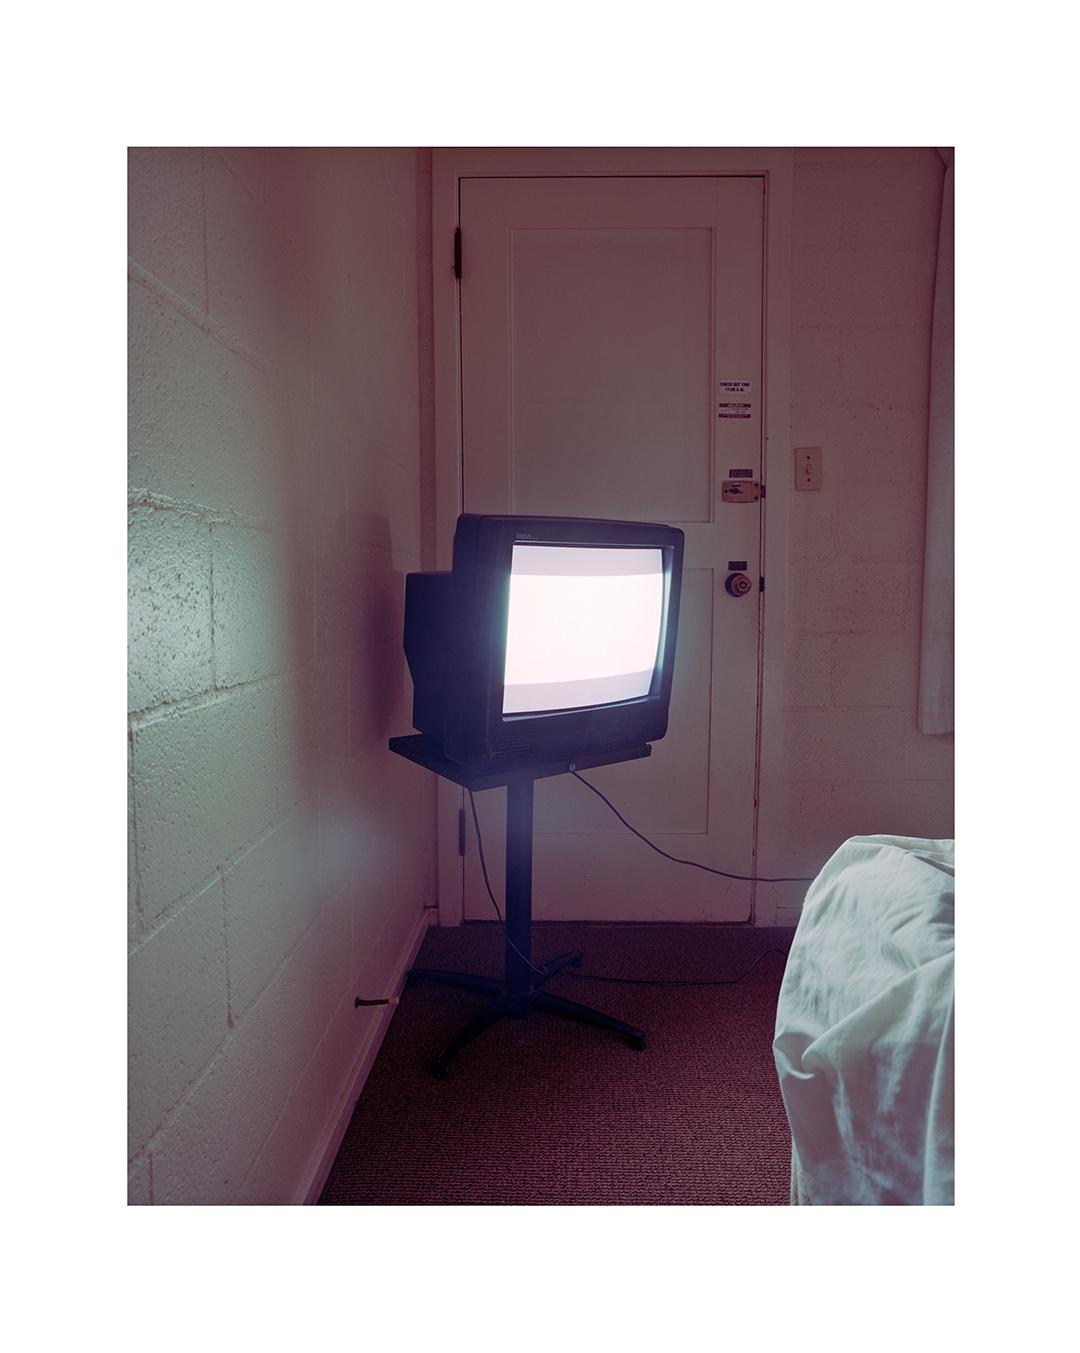 tv_020.jpg